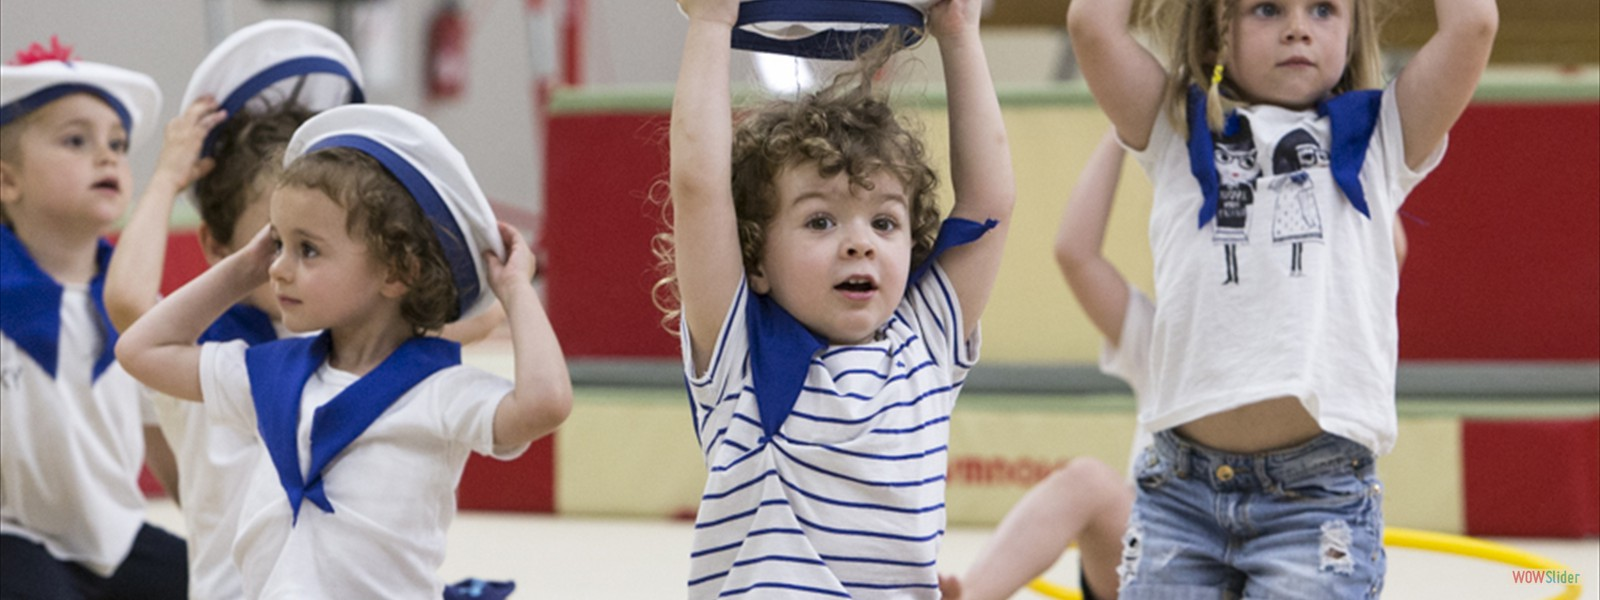 Baby gym / Eveil gymnique